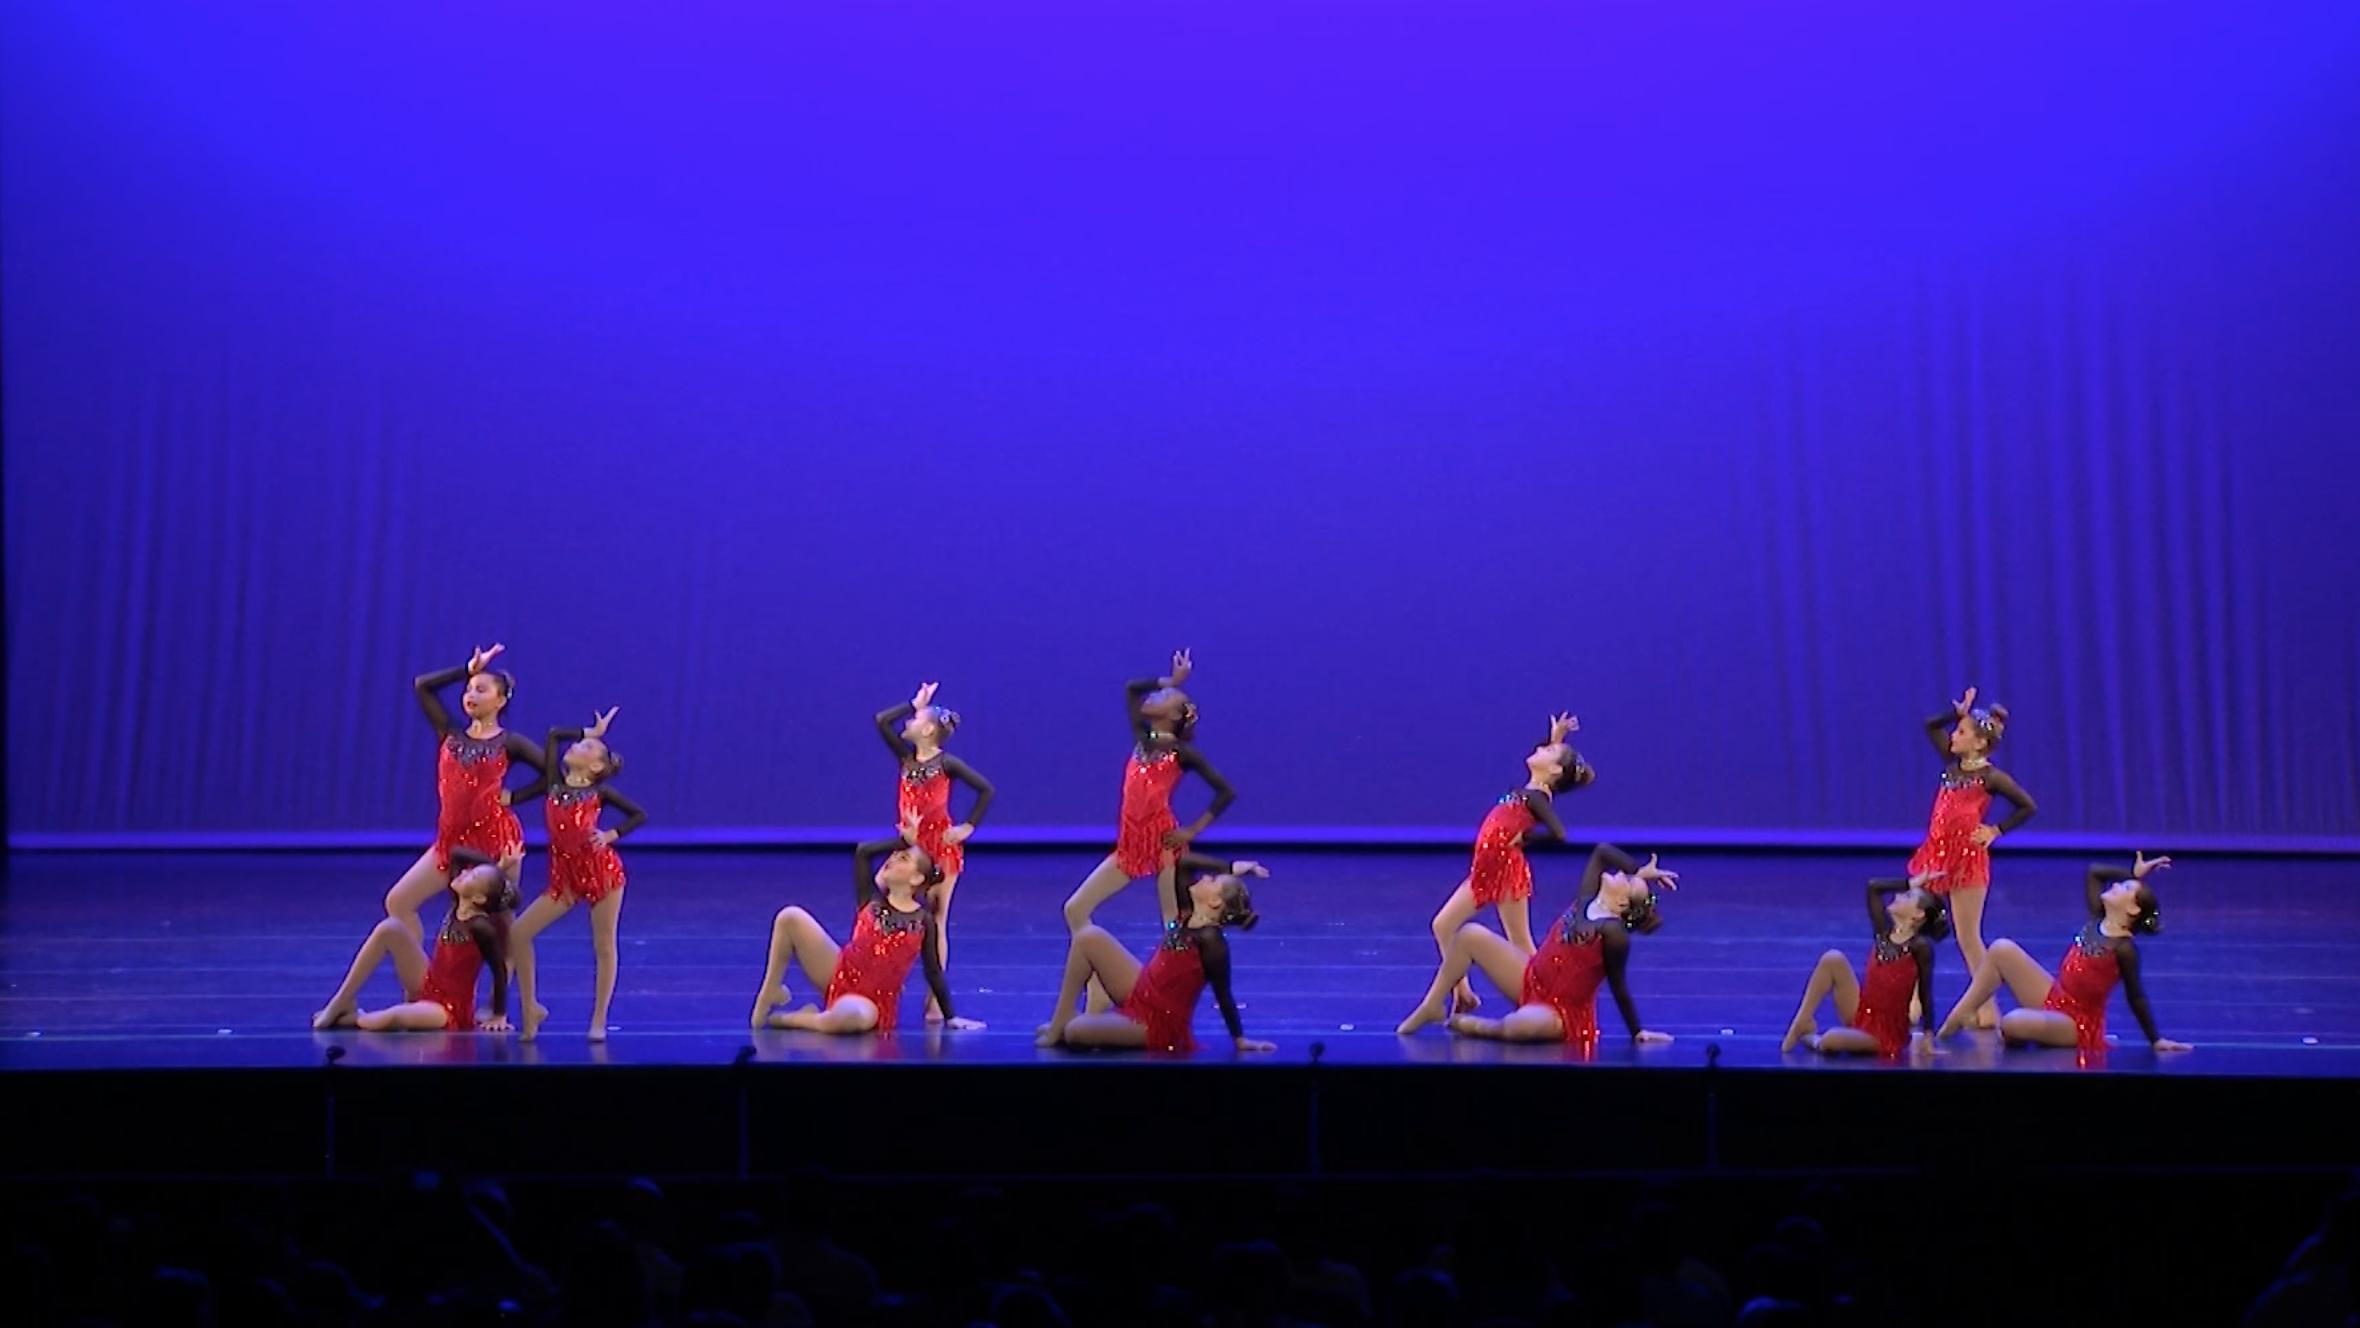 Wepa - Miami Dance Academy